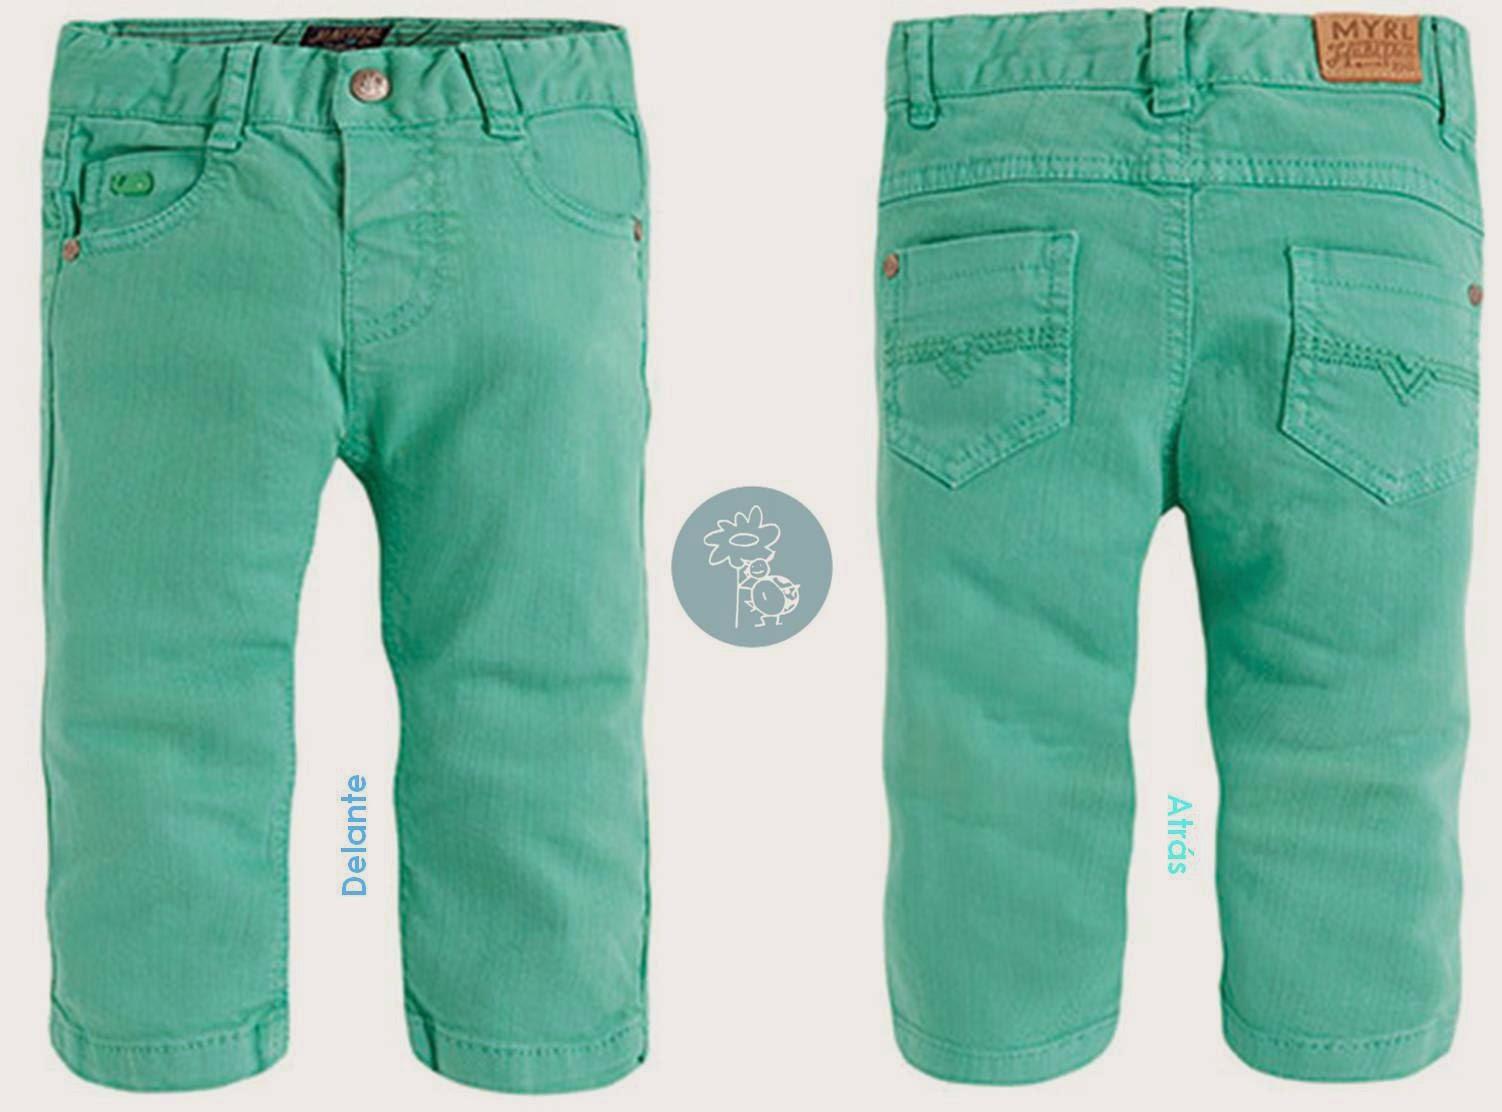 Mayoral pantalon largo turquesa boys en Blog Retamal moda infantil y bebe